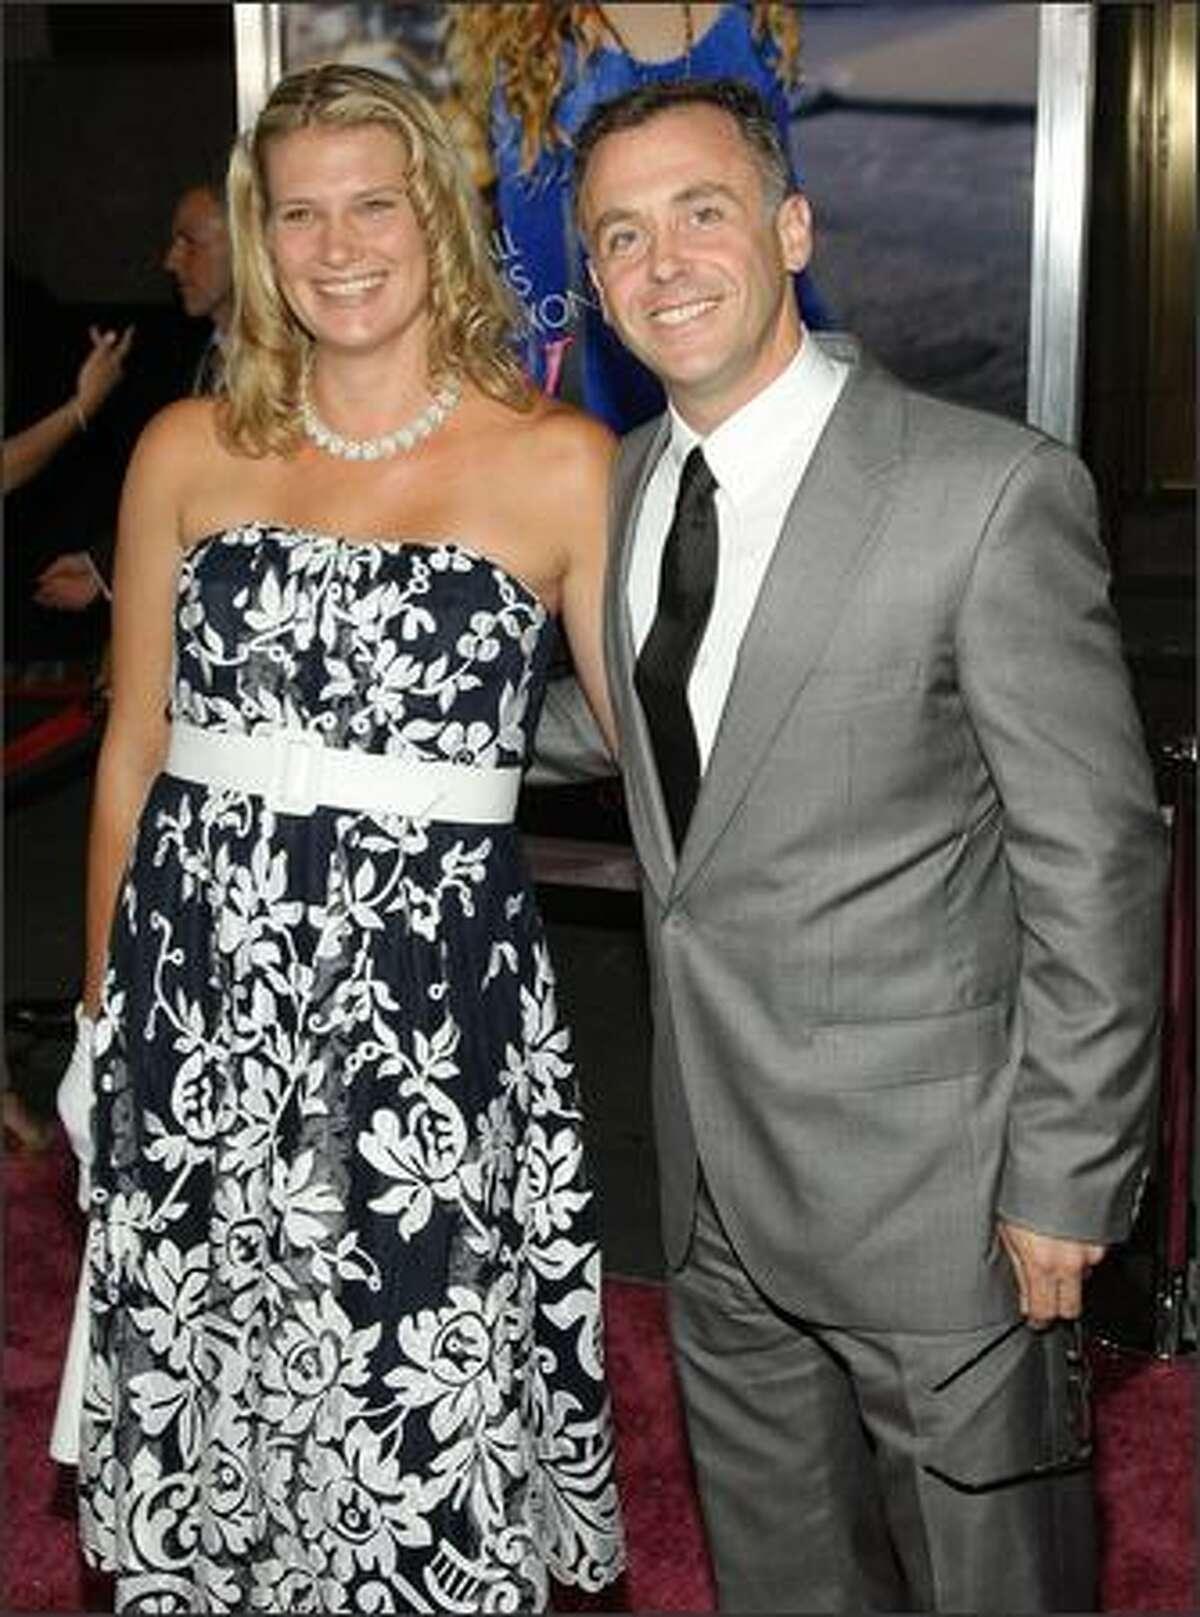 Chrissy Eigenberg and actor David Eigenberg.